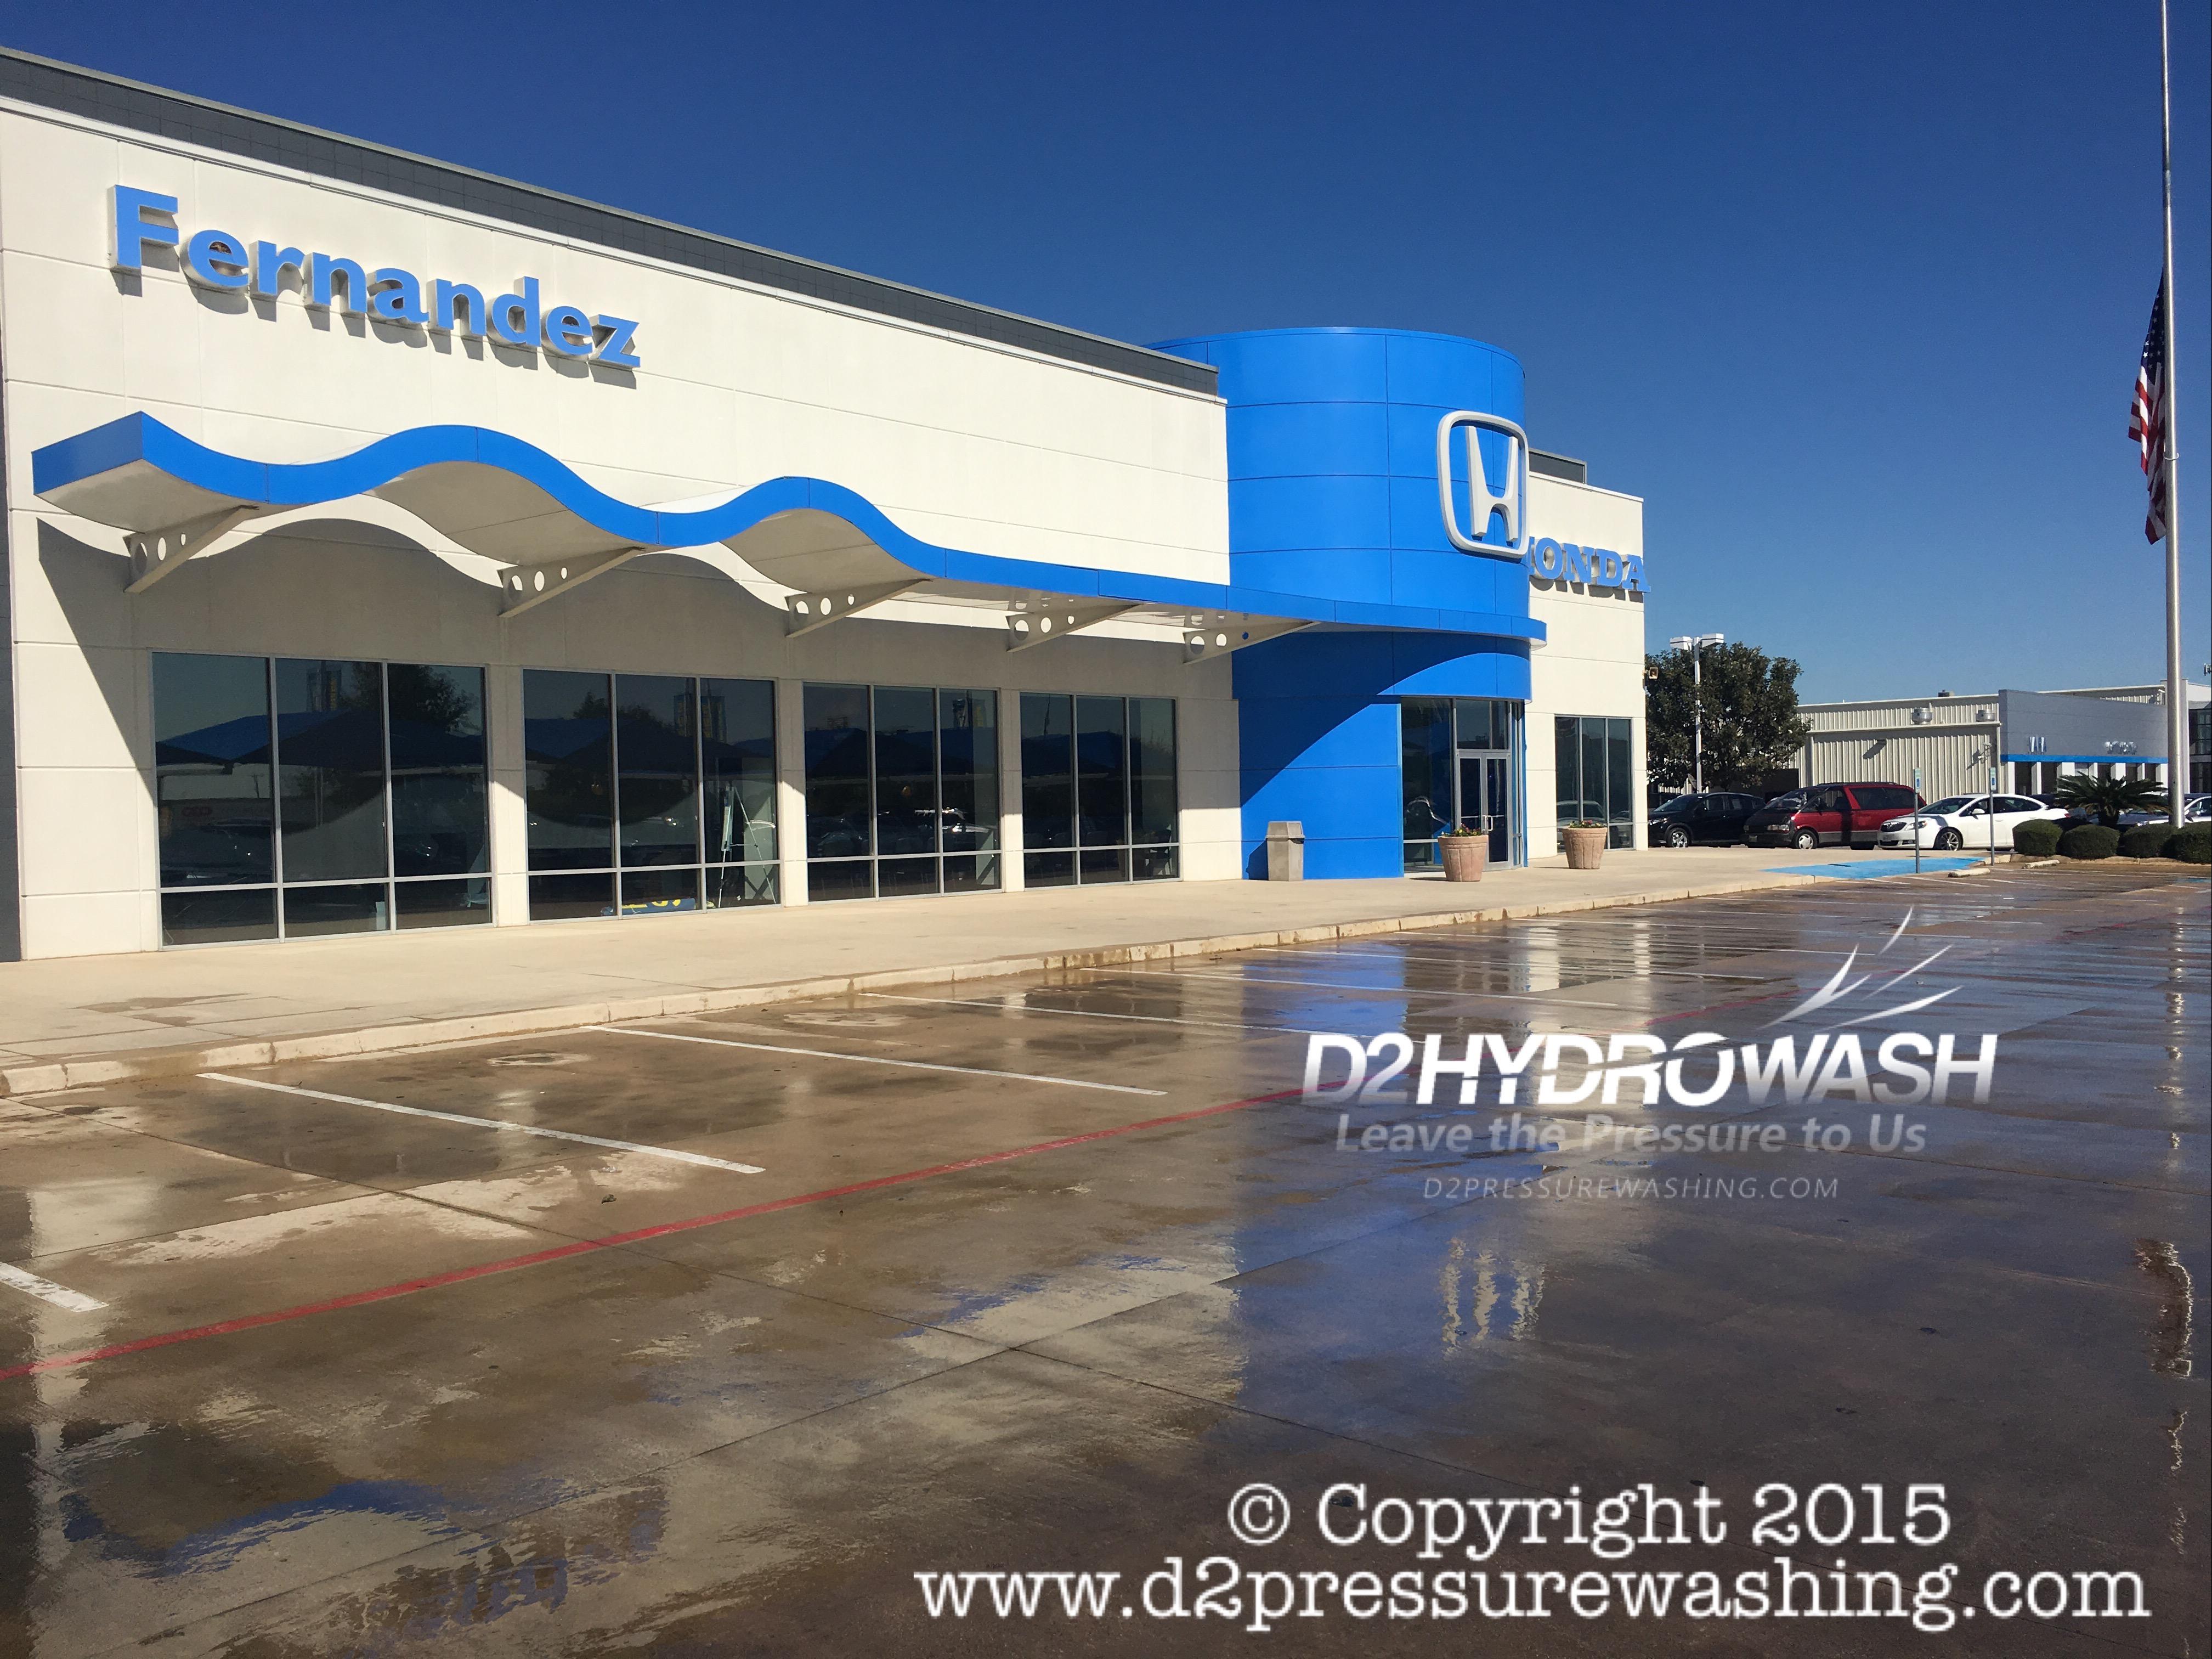 D2hydro wash llc video image gallery proview for Fernandez honda san antonio tx